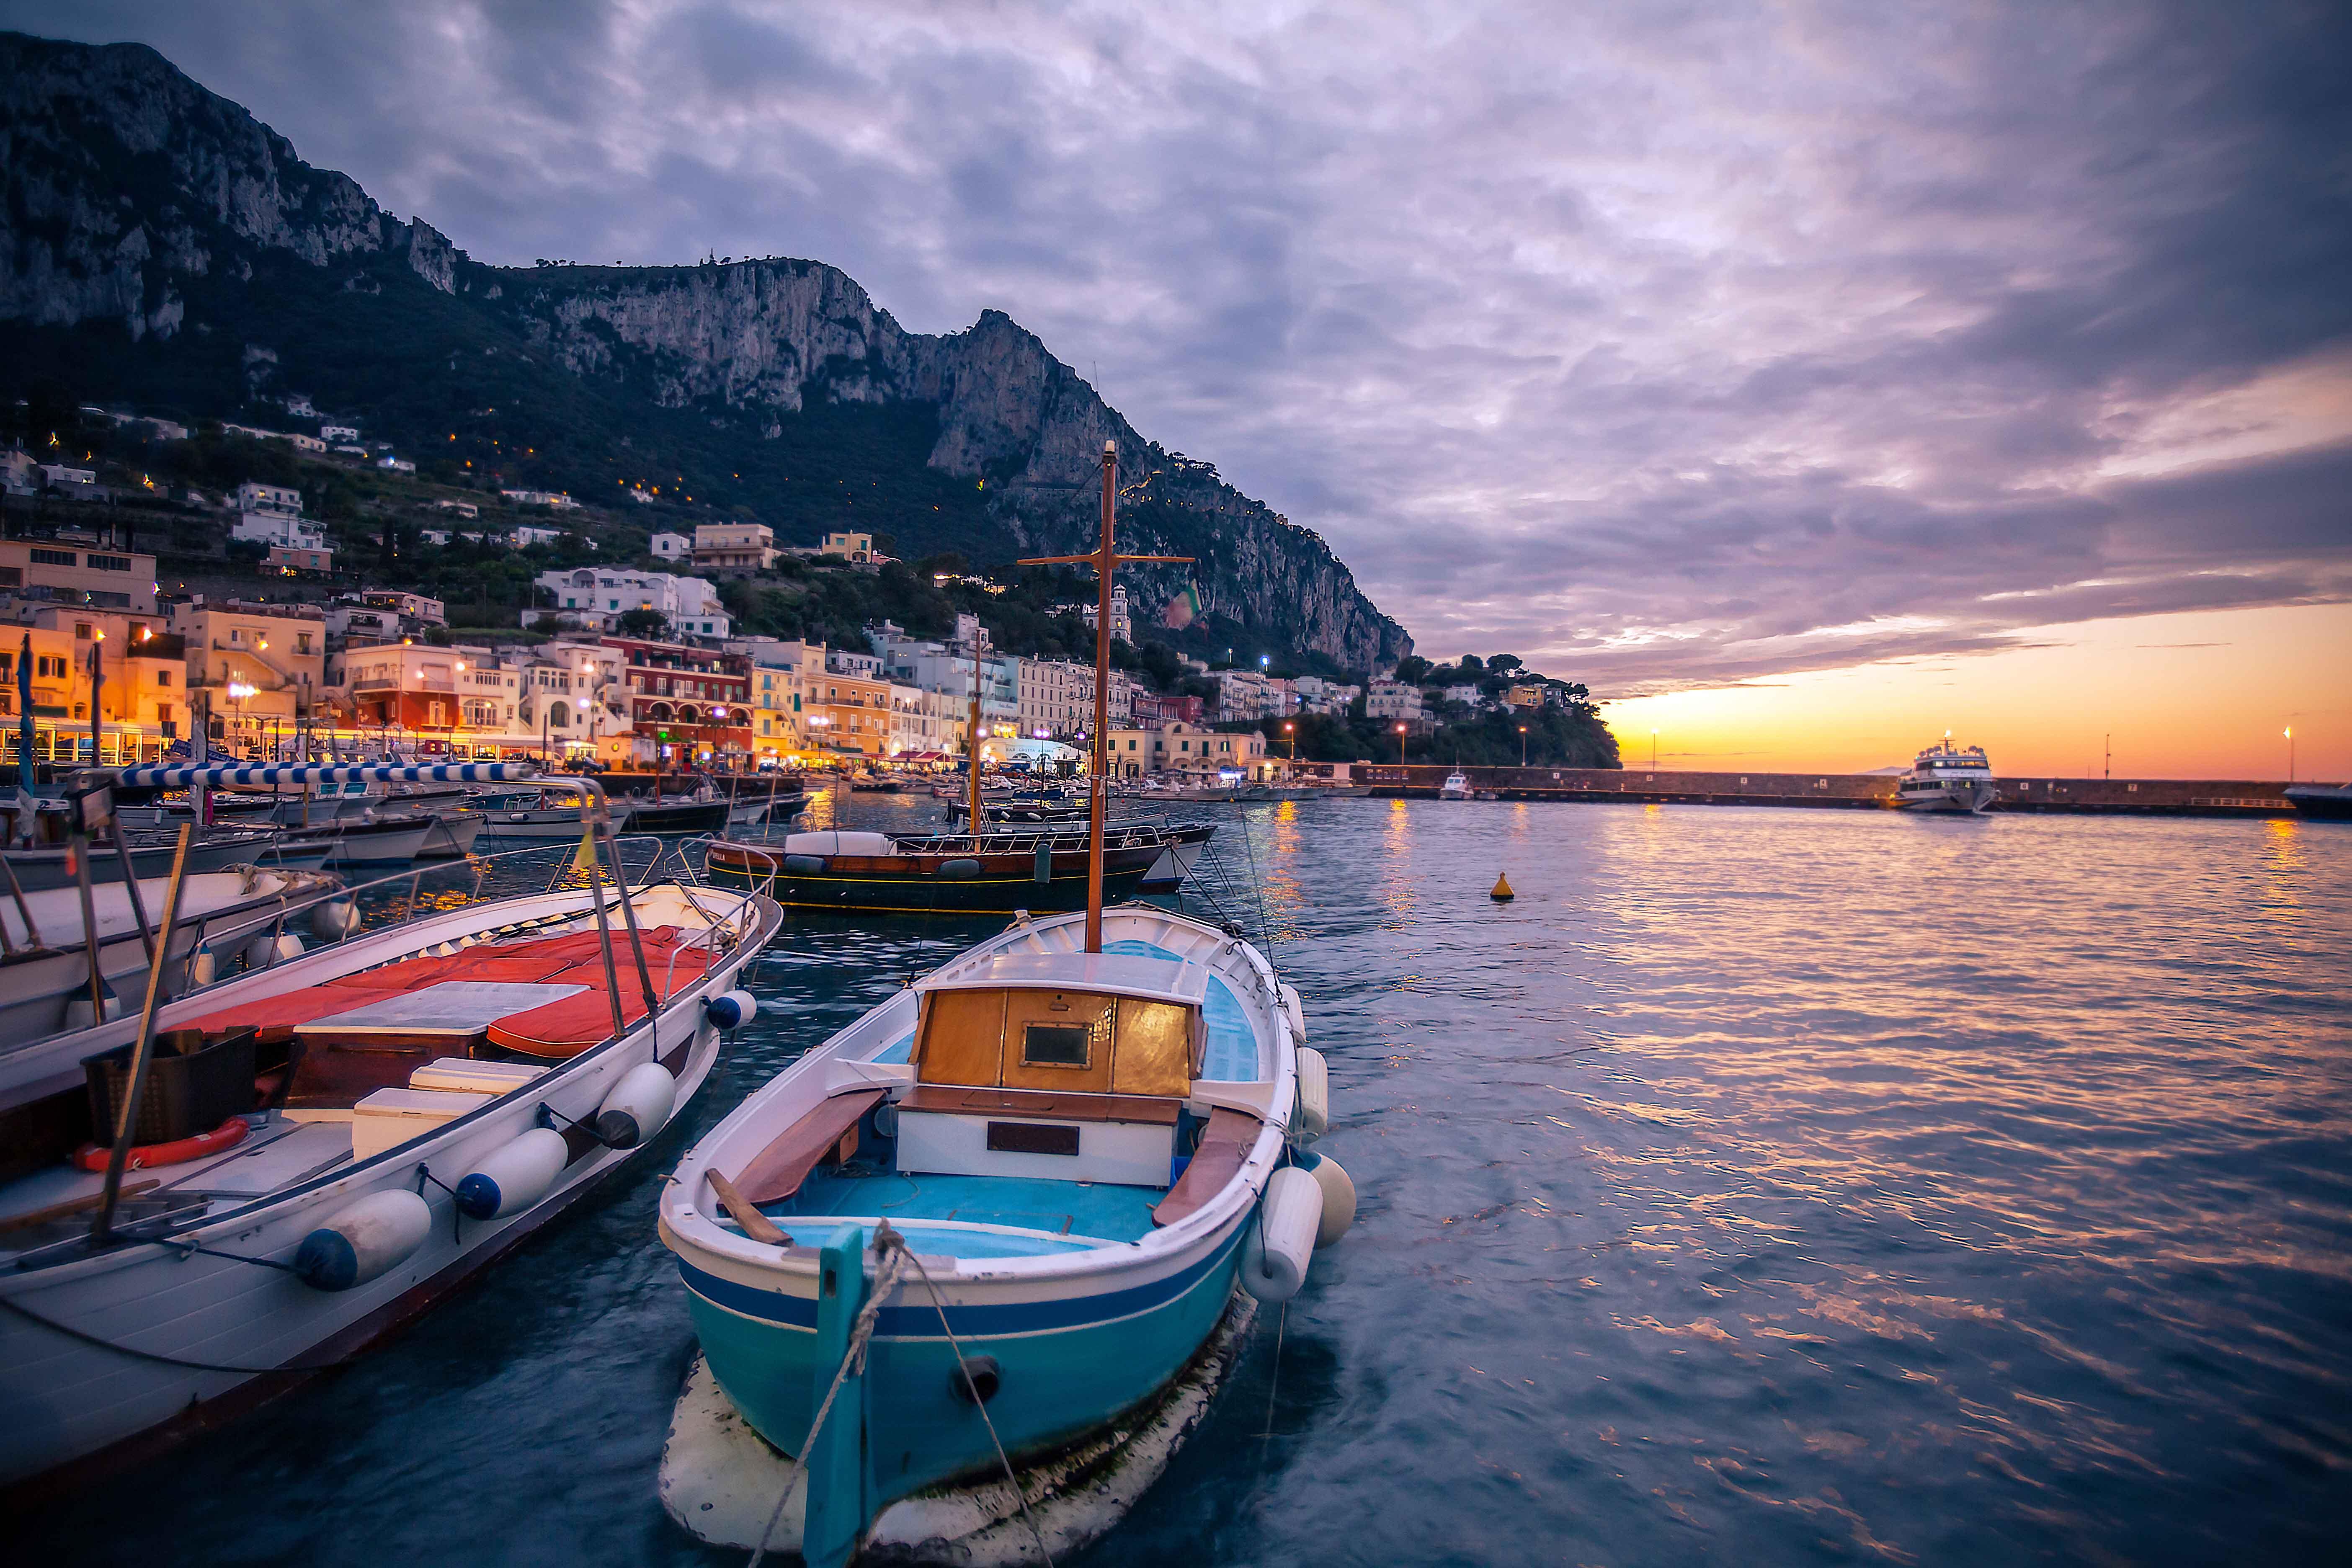 Canva---Picturesque-boats-in-Capri-Marina-Grande-at-sunset